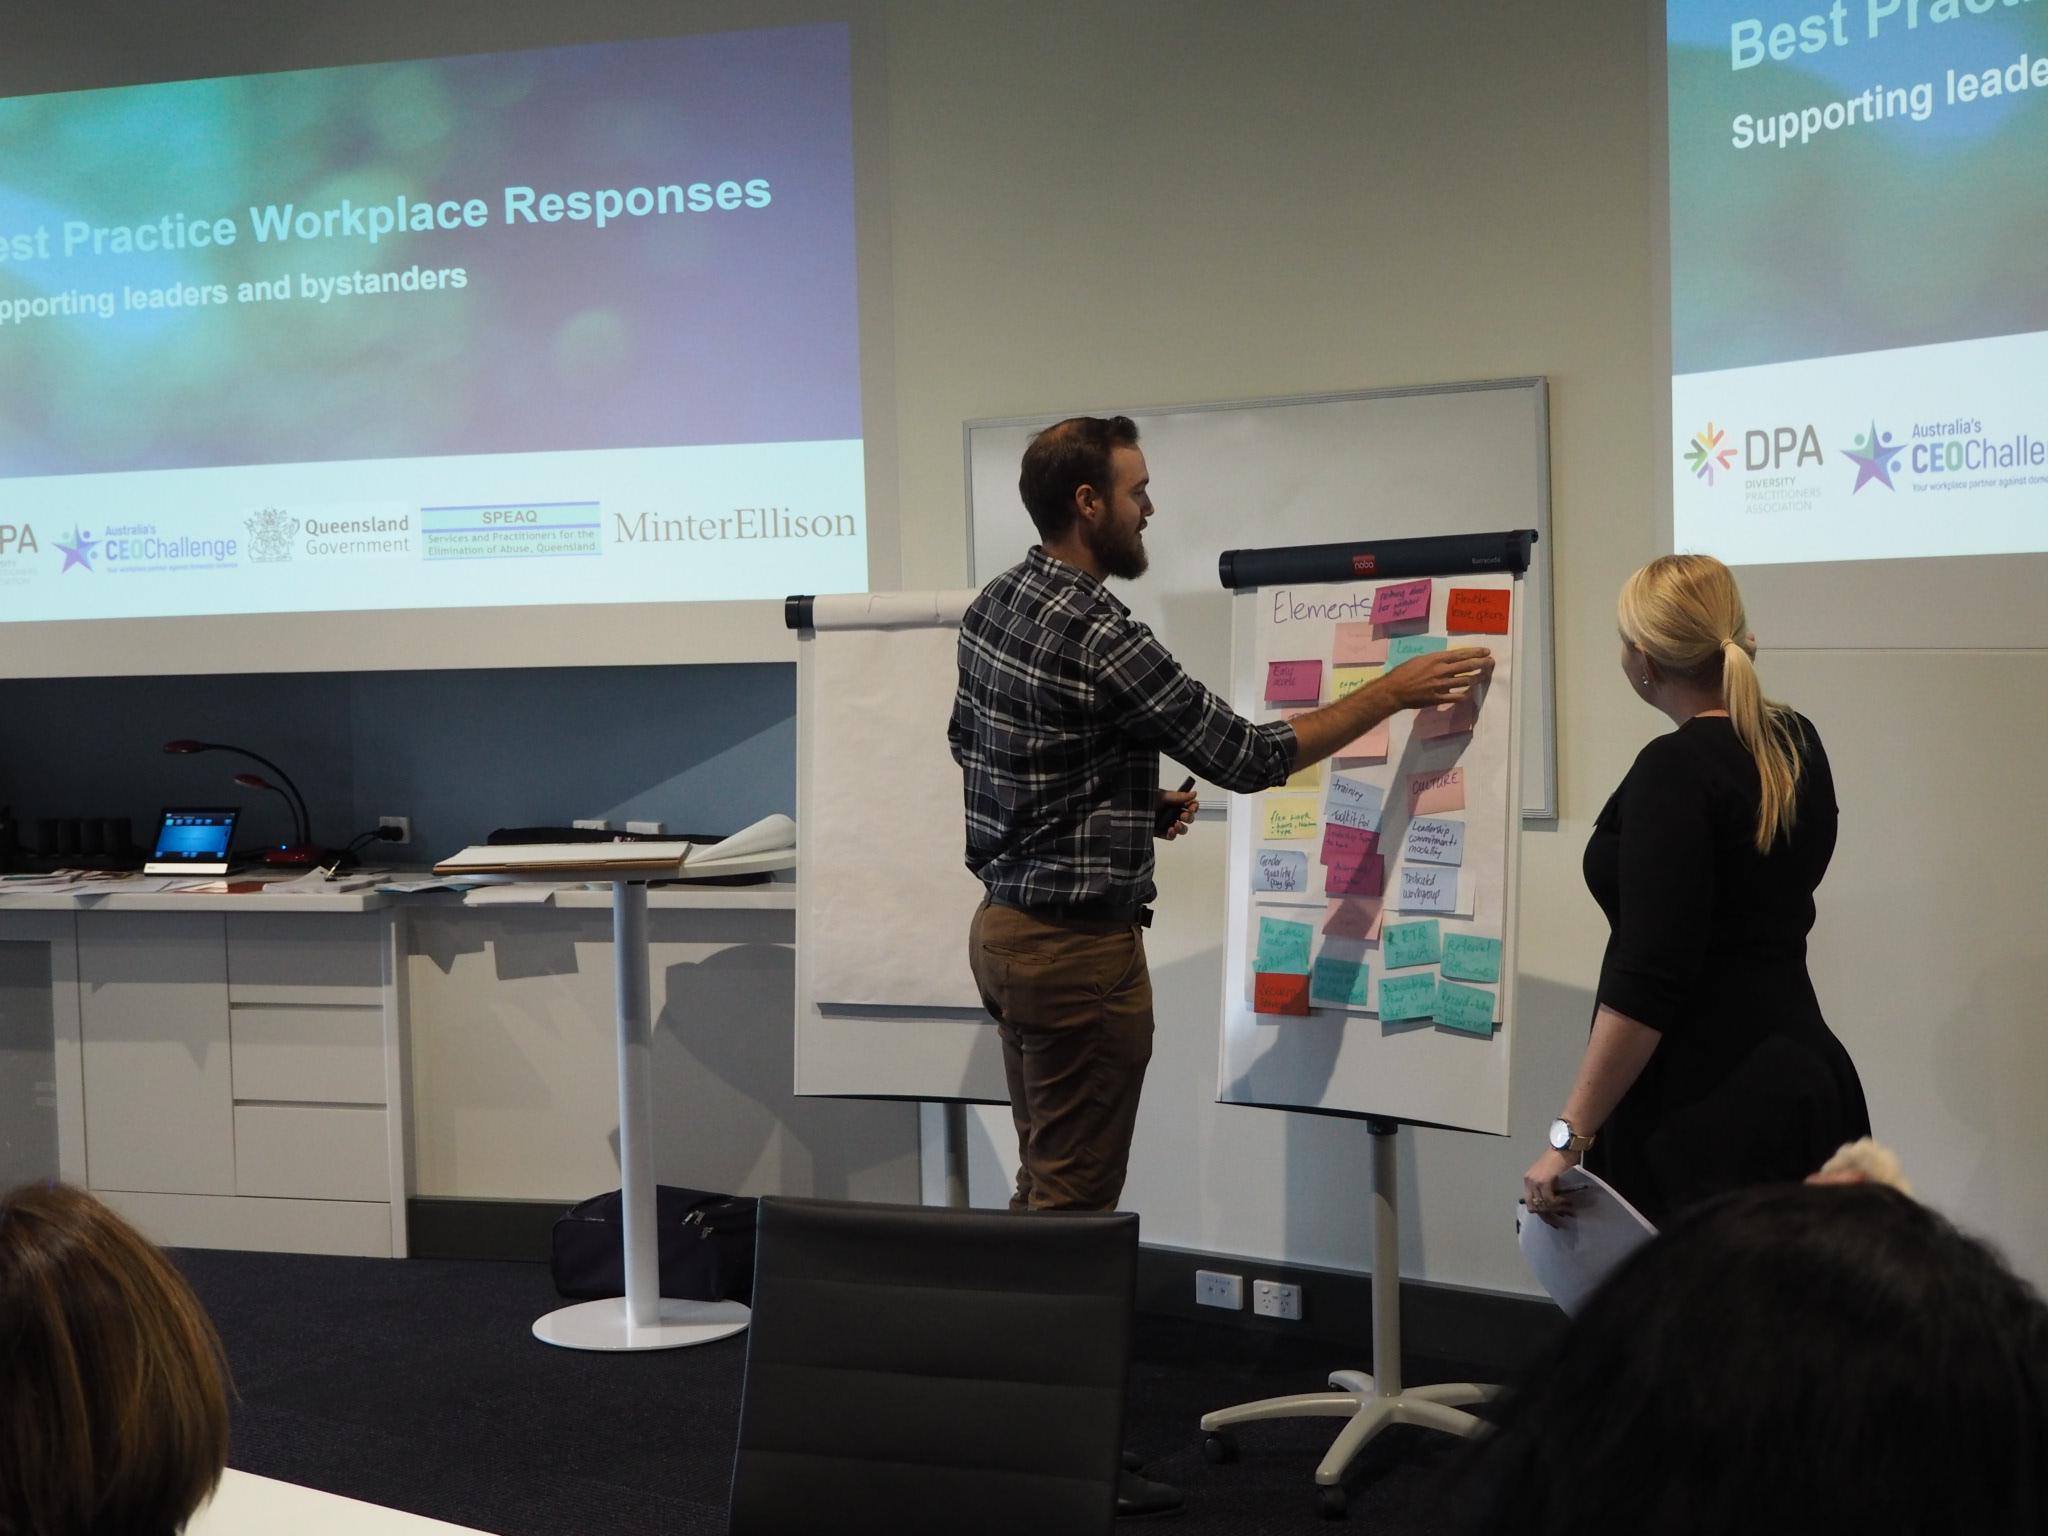 Workshop 3 b_DPA DFV Symposium.jpg